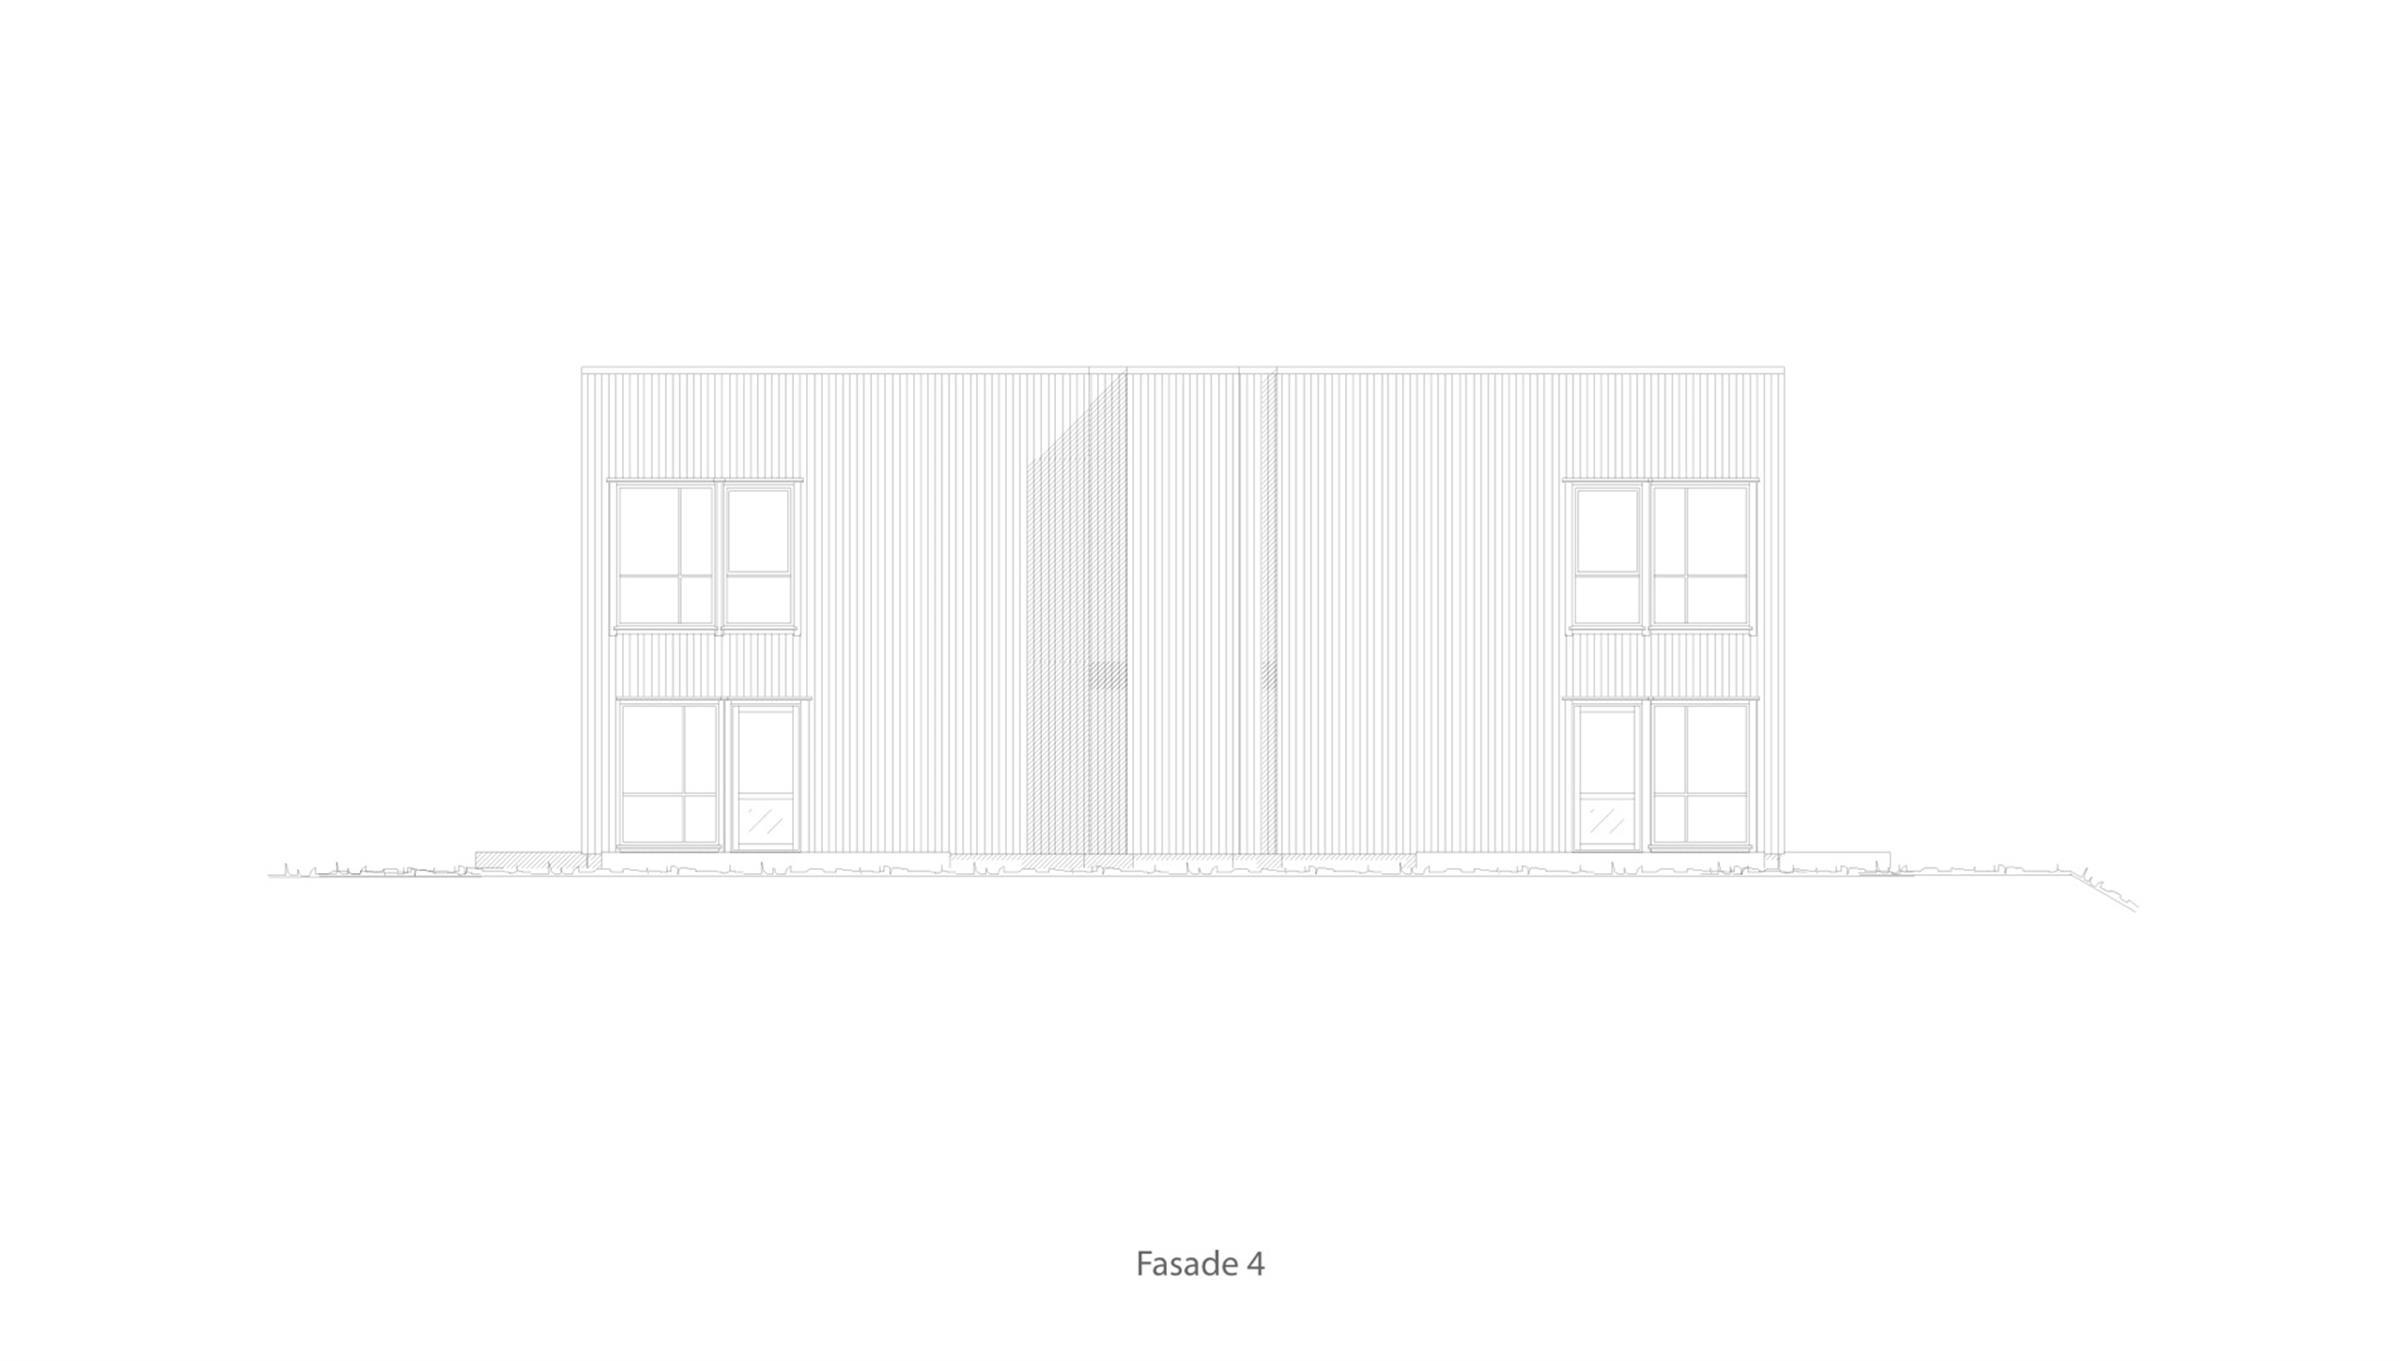 Moelv fasade 4